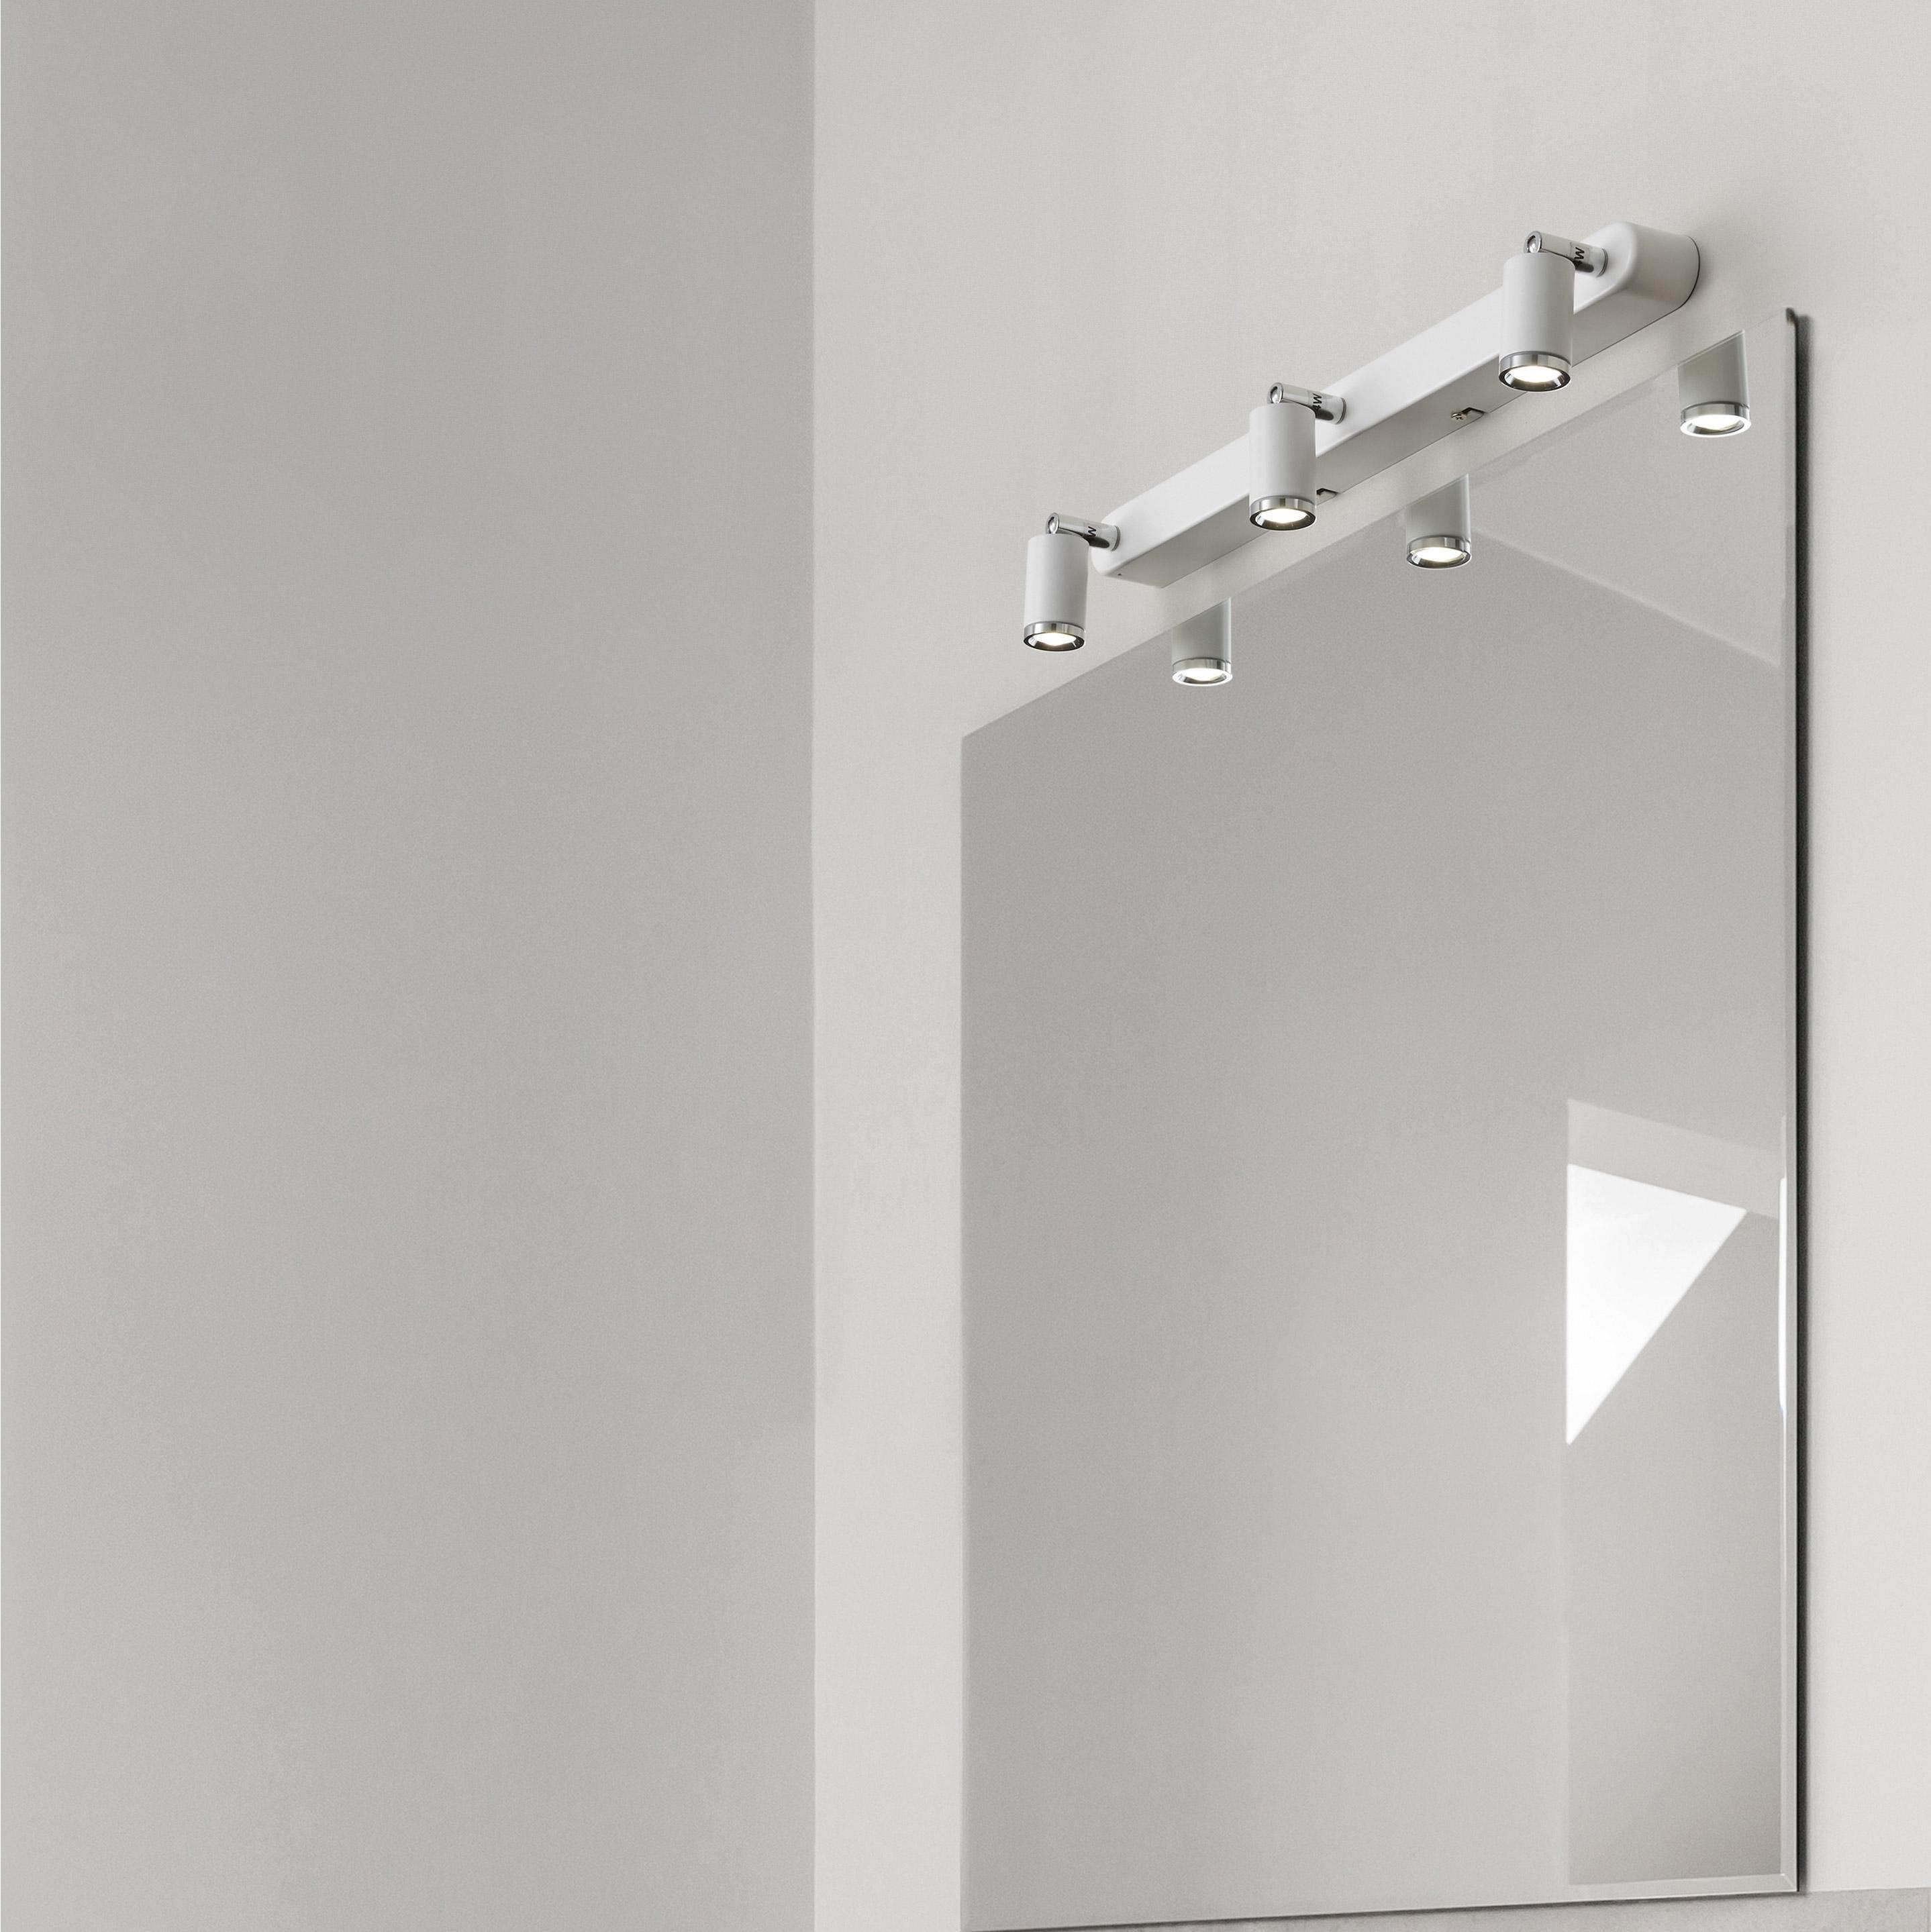 Rampe 3 spots led intégrée, industriel, métal, LUMIPLUS Tivoli